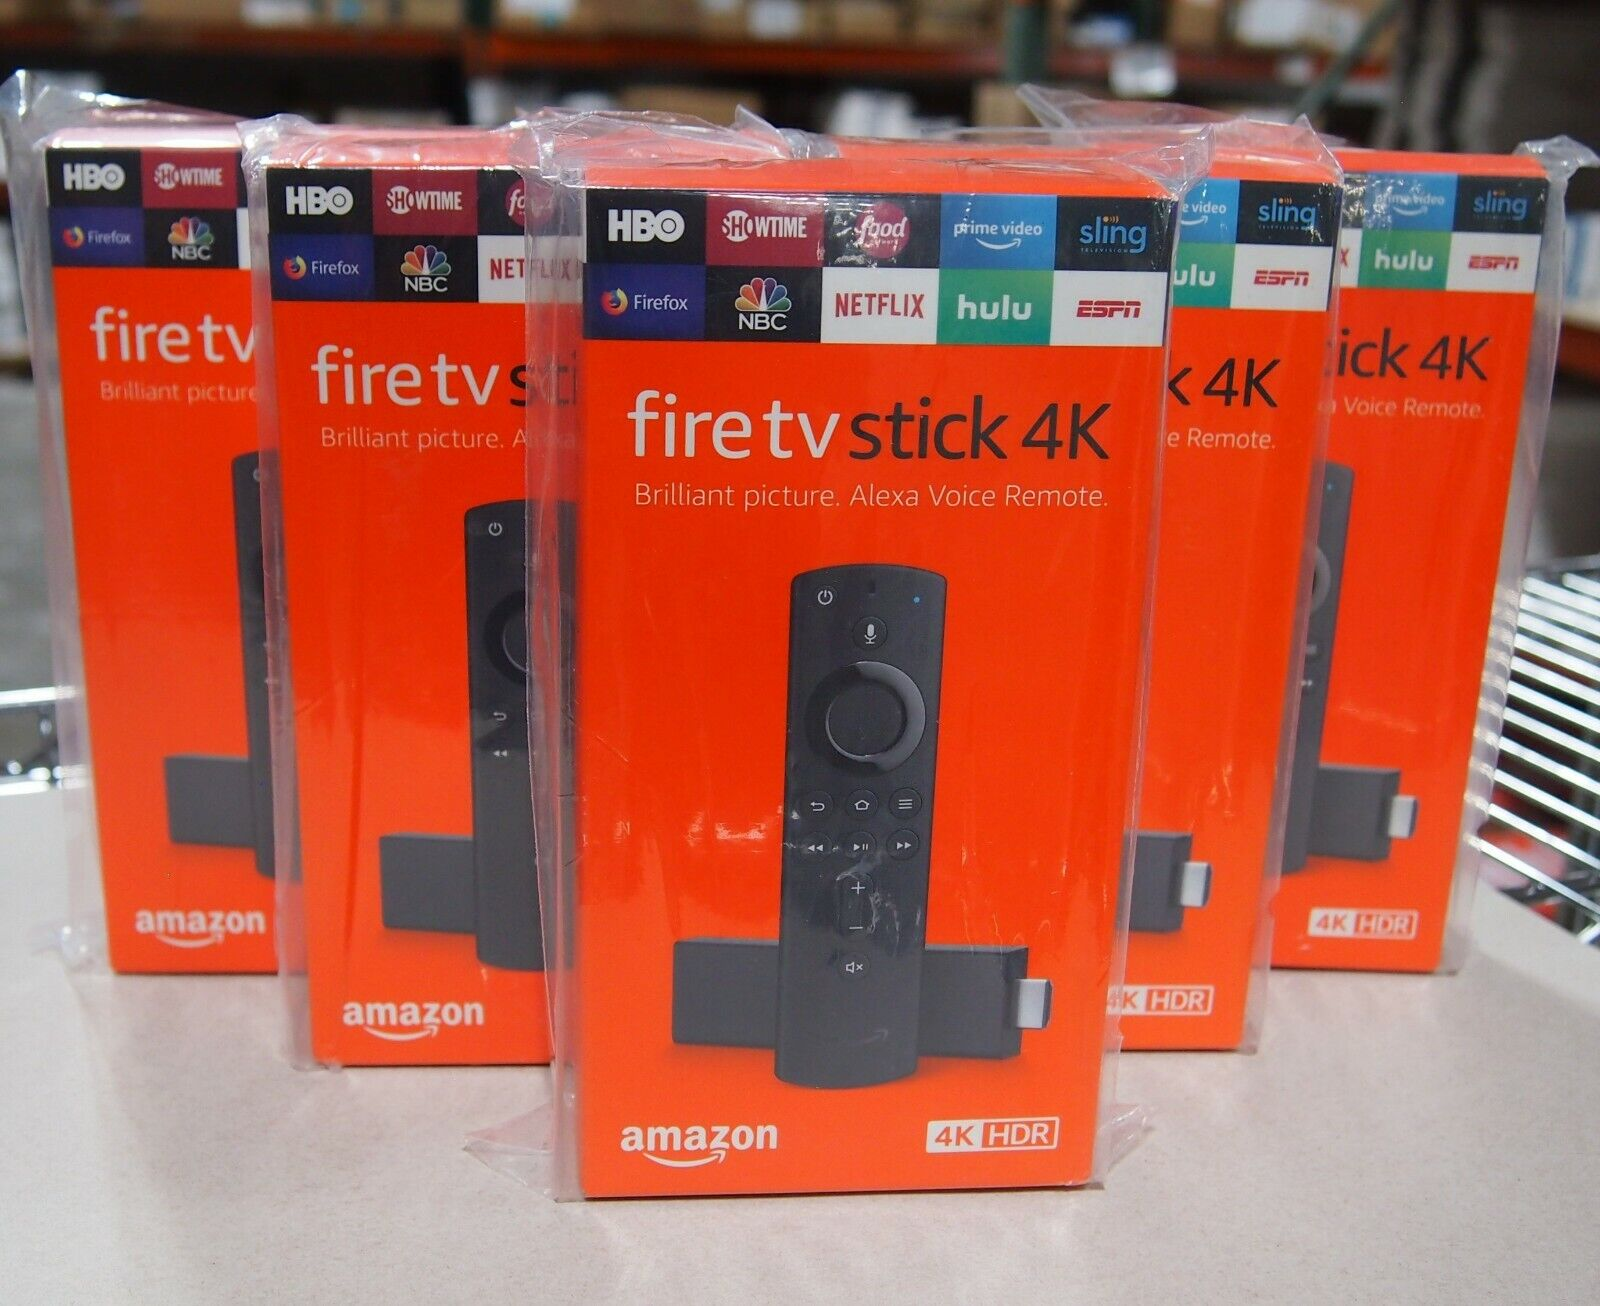 Amazon Fire TV Stick 4K with Alexa Voice Remote, Streaming Media Player - Black alexa amazon black fire media player stick streaming voice with